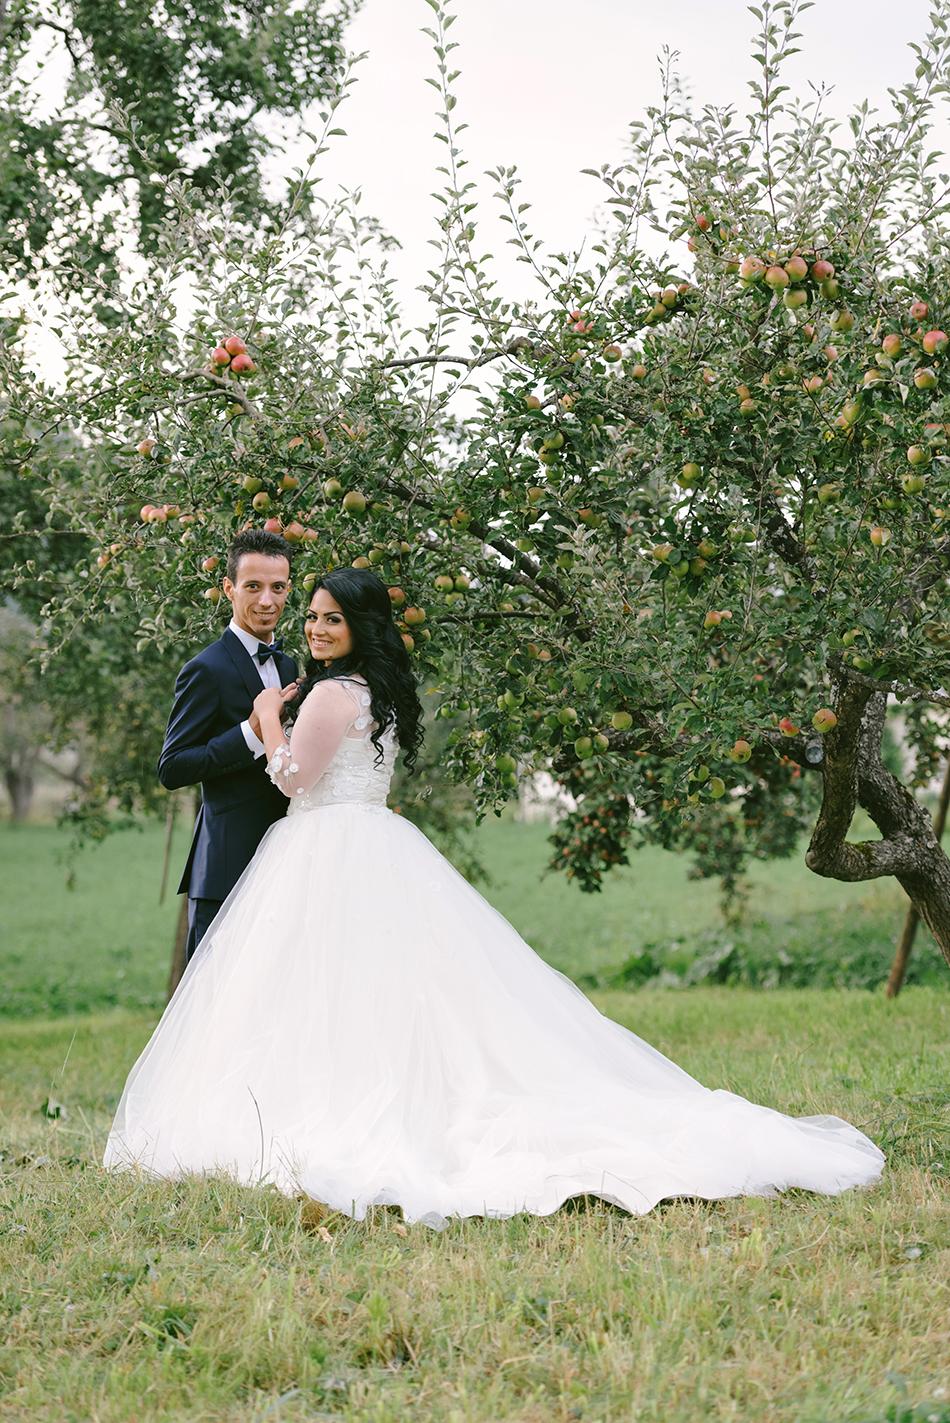 AD Passion Photography | ad-passion_diana-si-gabi_fotograf-nunta-suceava_0043 | Adelin, Dida, fotograf profesionist, fotograf de nunta, fotografie de nunta, fotograf Timisoara, fotograf Craiova, fotograf Bucuresti, fotograf Arad, nunta Timisoara, nunta Arad, nunta Bucuresti, nunta Craiova